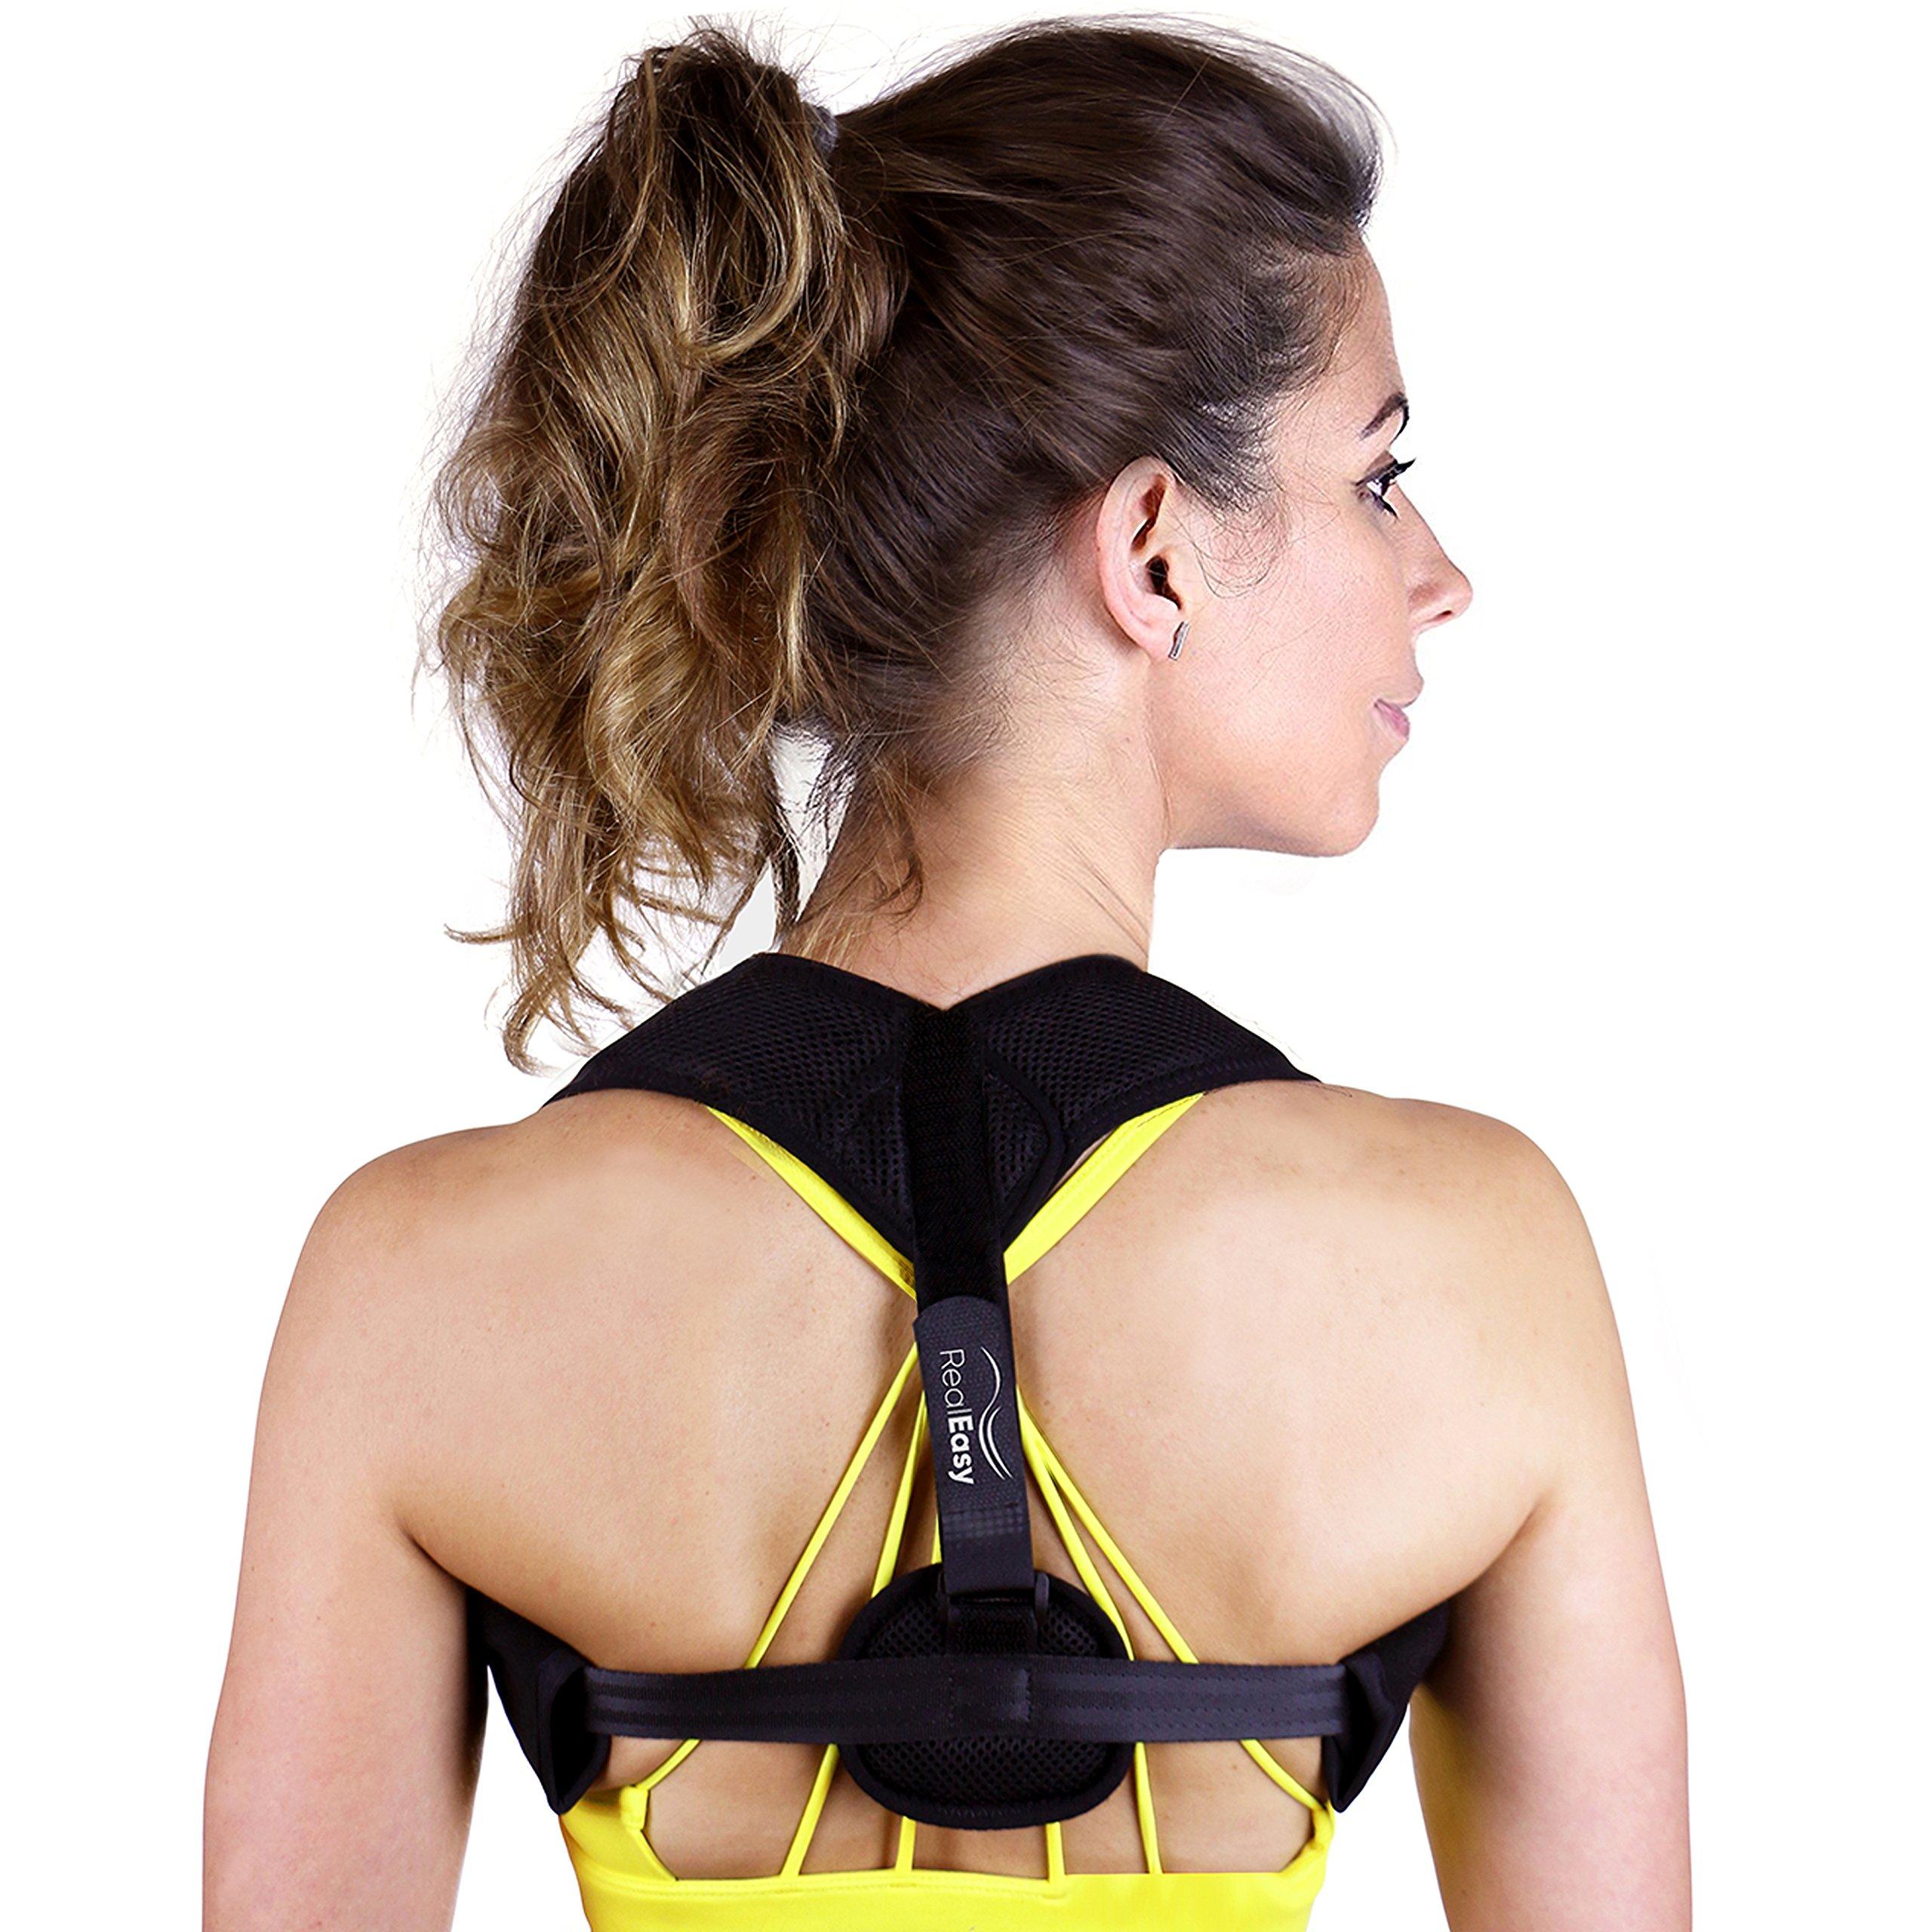 Posture Corrector for Women & Men | Posture Brace for Slouching & Hunching | Shoulder Brace for Back Support - Improve Posture, Prevent Slouching, Reduce Neck & Back Pain